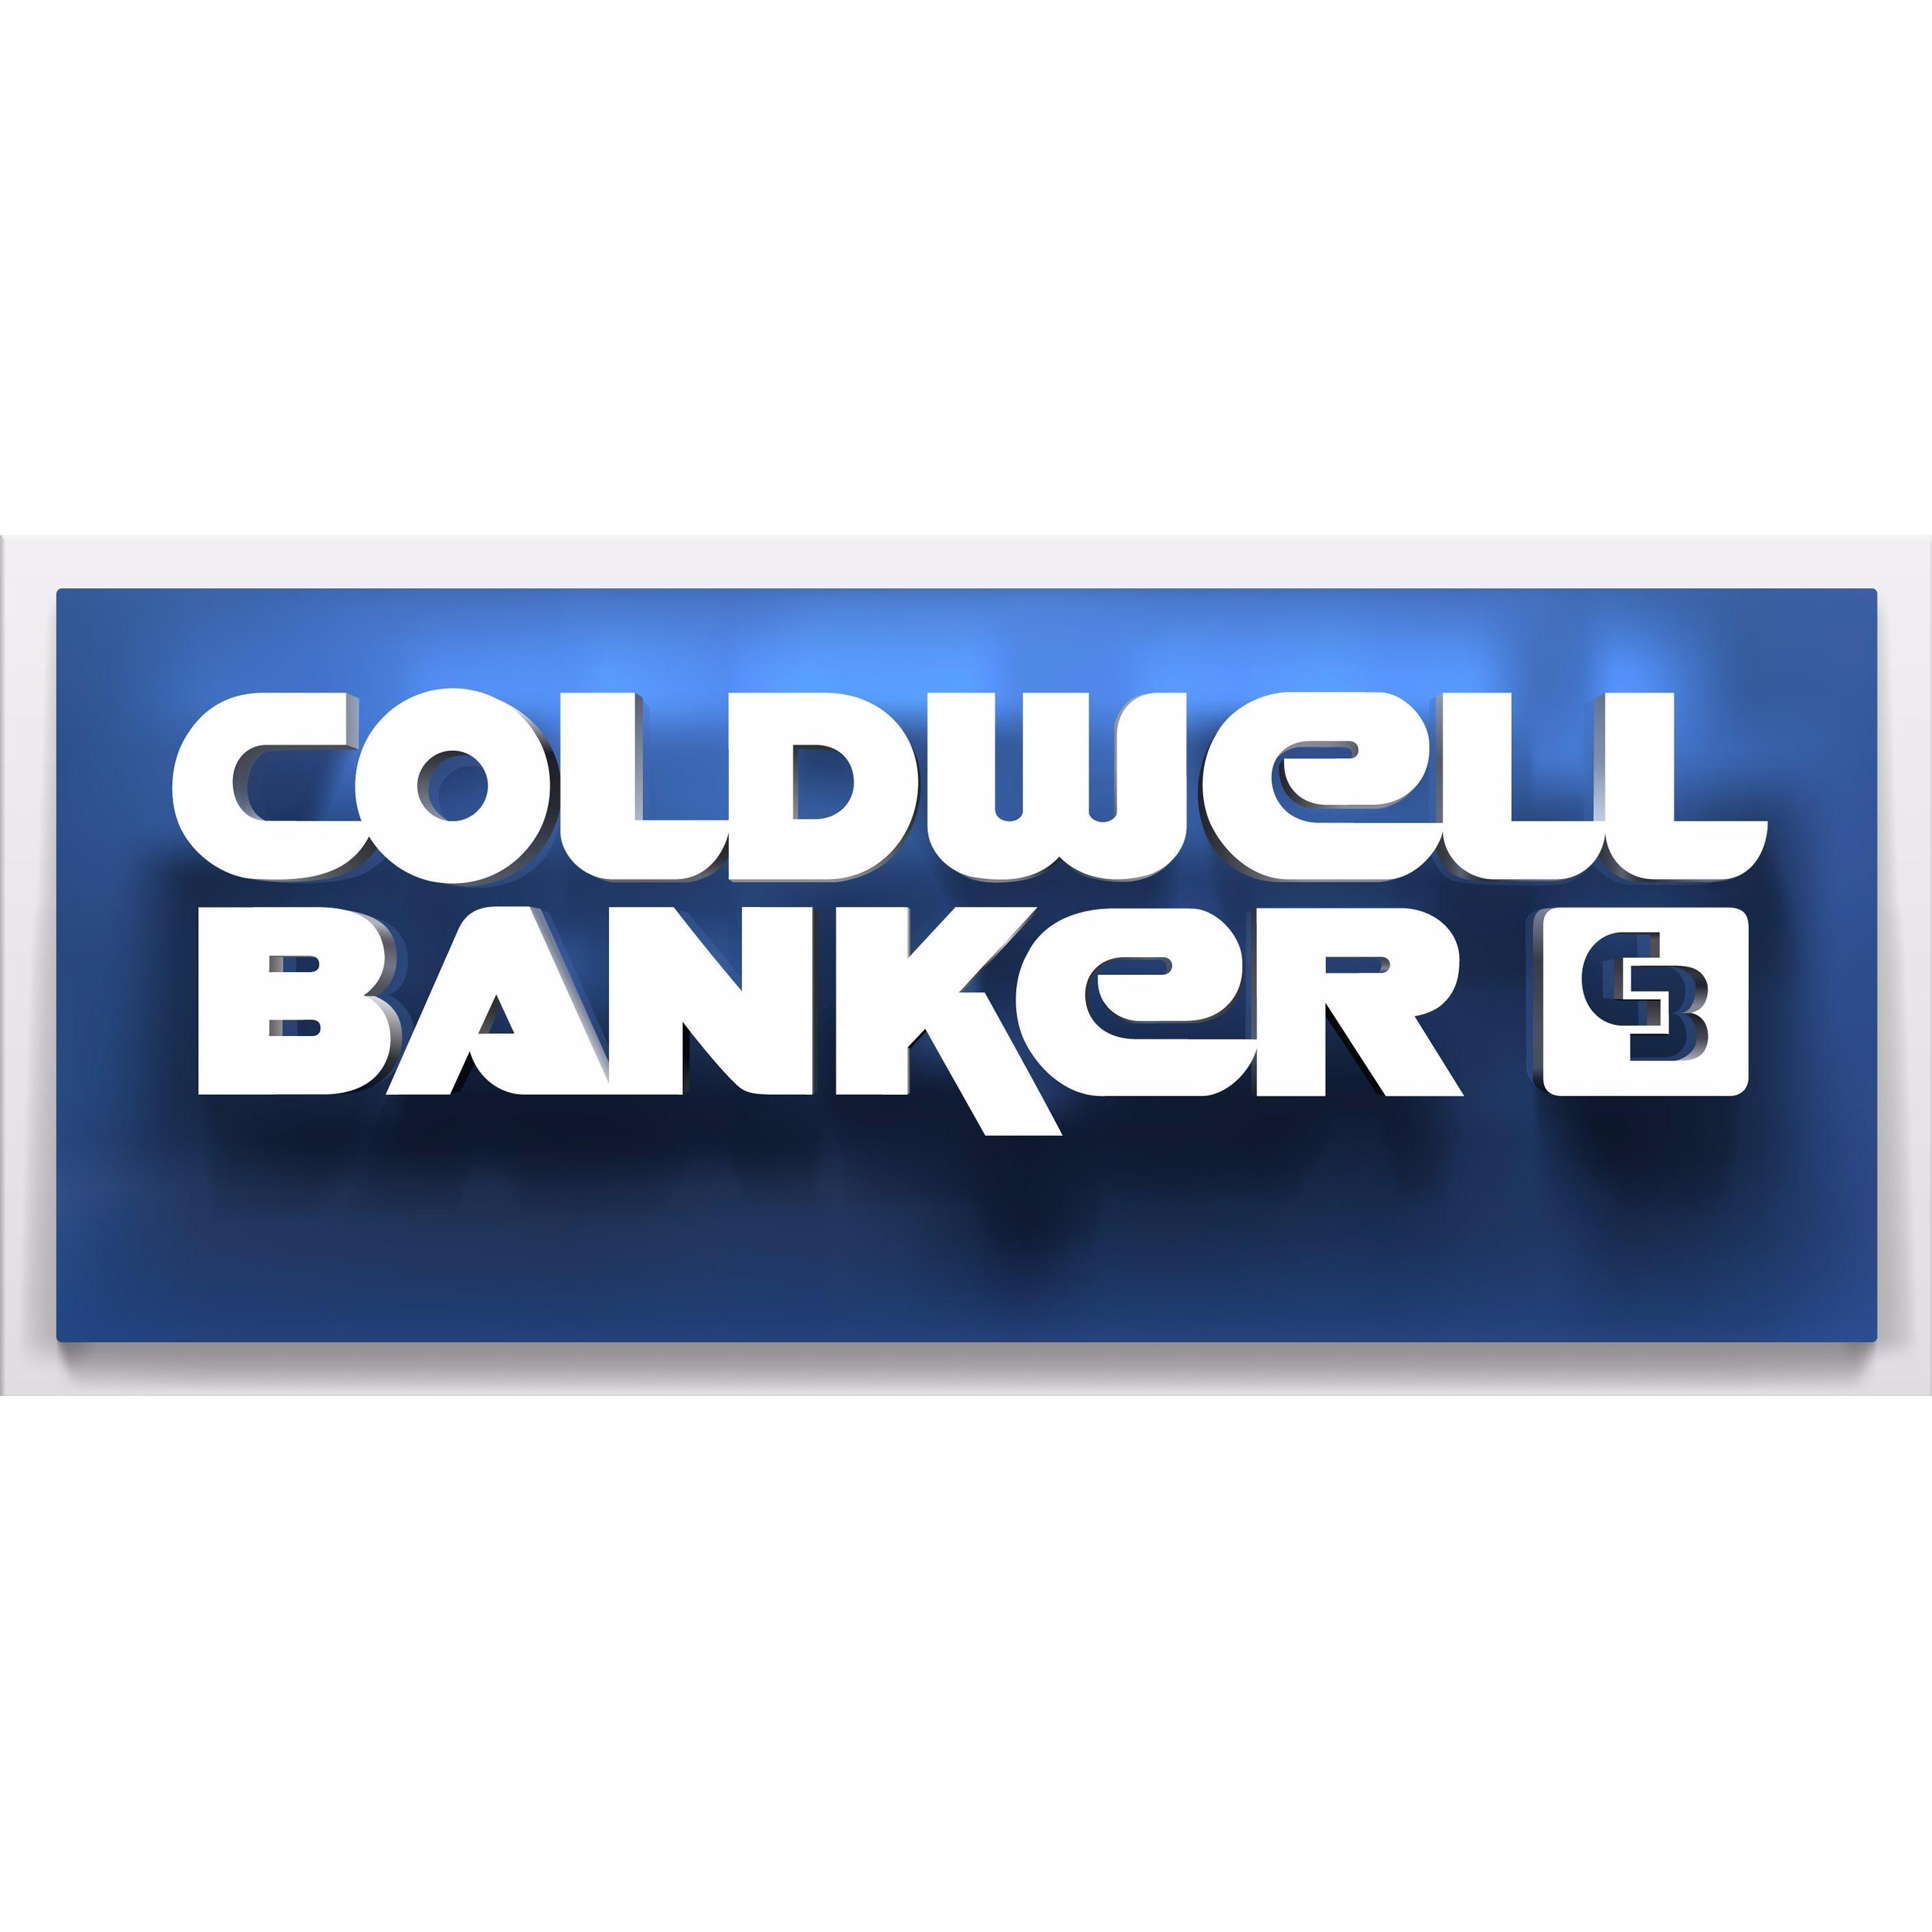 Patricia Ekvall, Sales Associate - Coldwell Banker